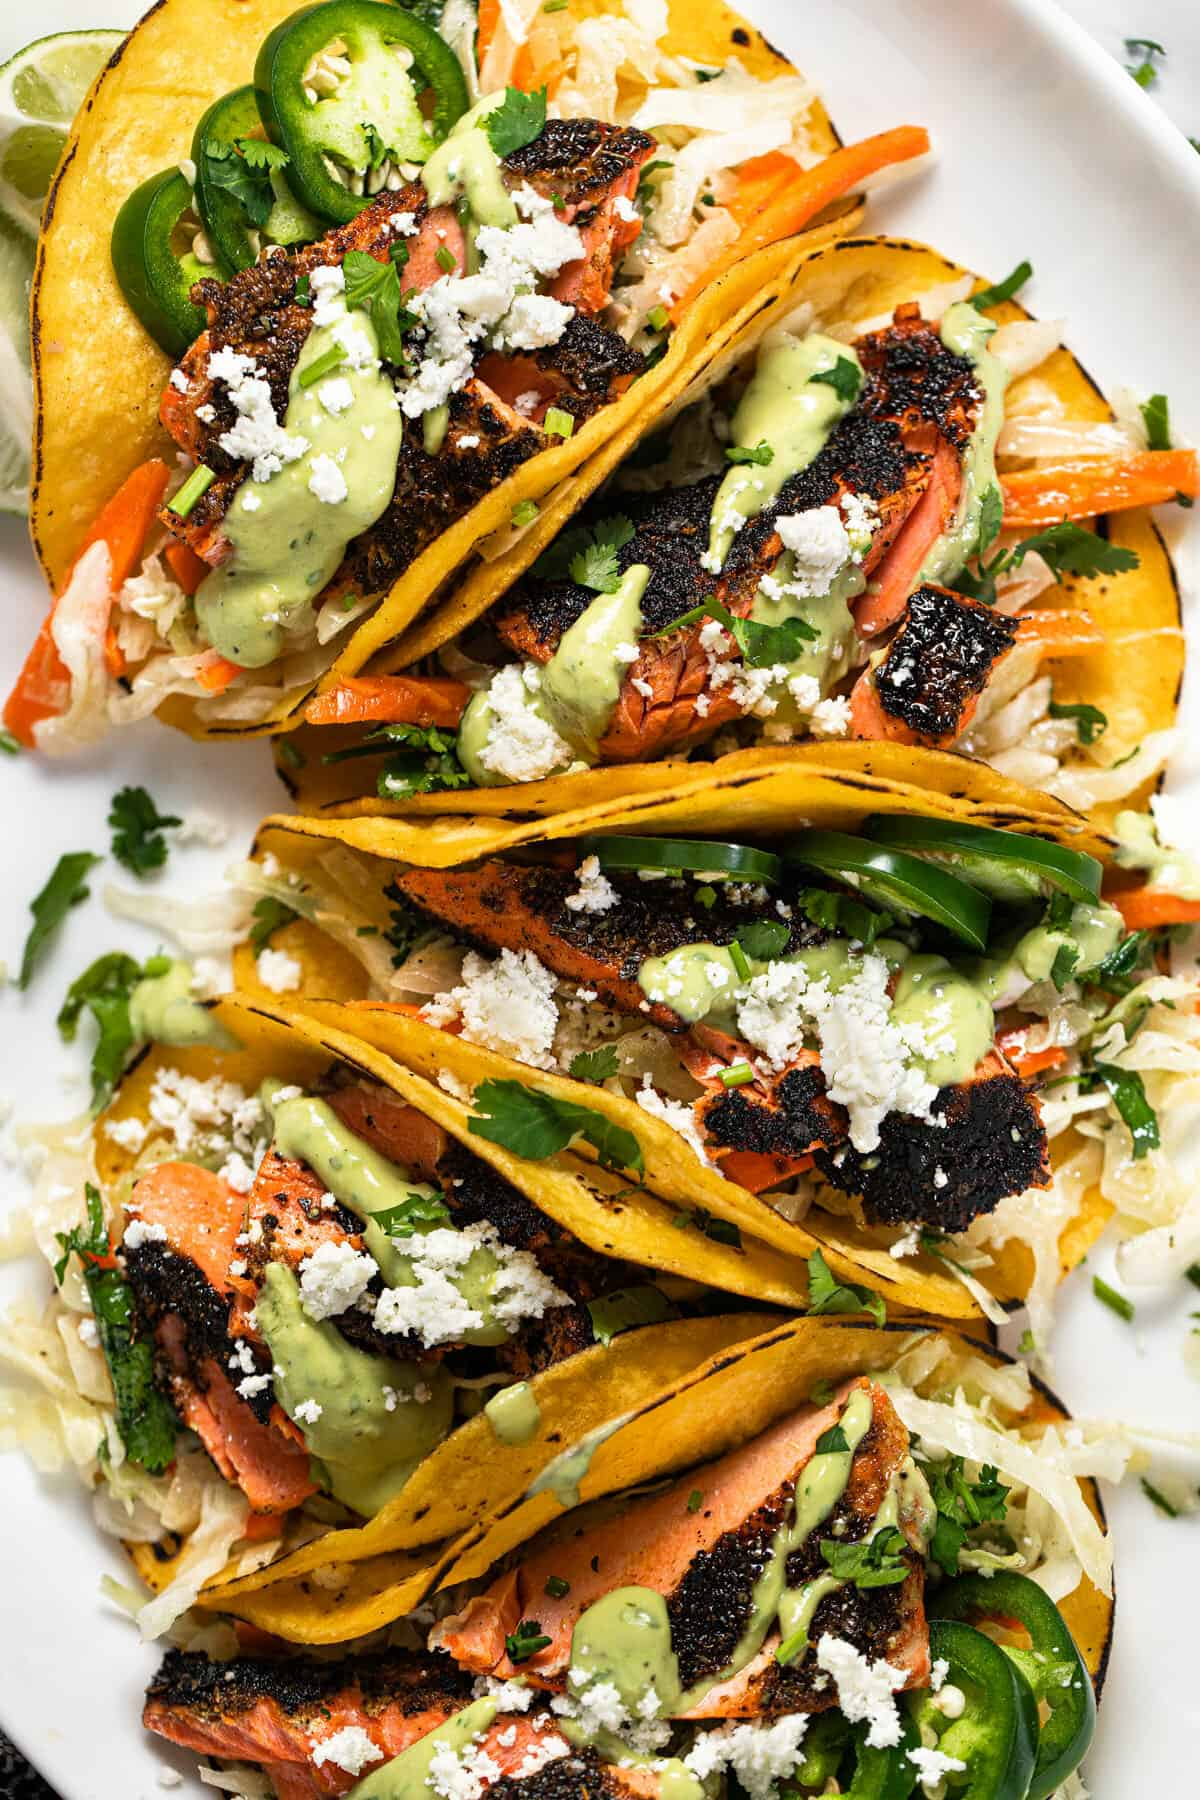 Close up shot of a tasty salmon taco recipe garnished with fresh cilantro